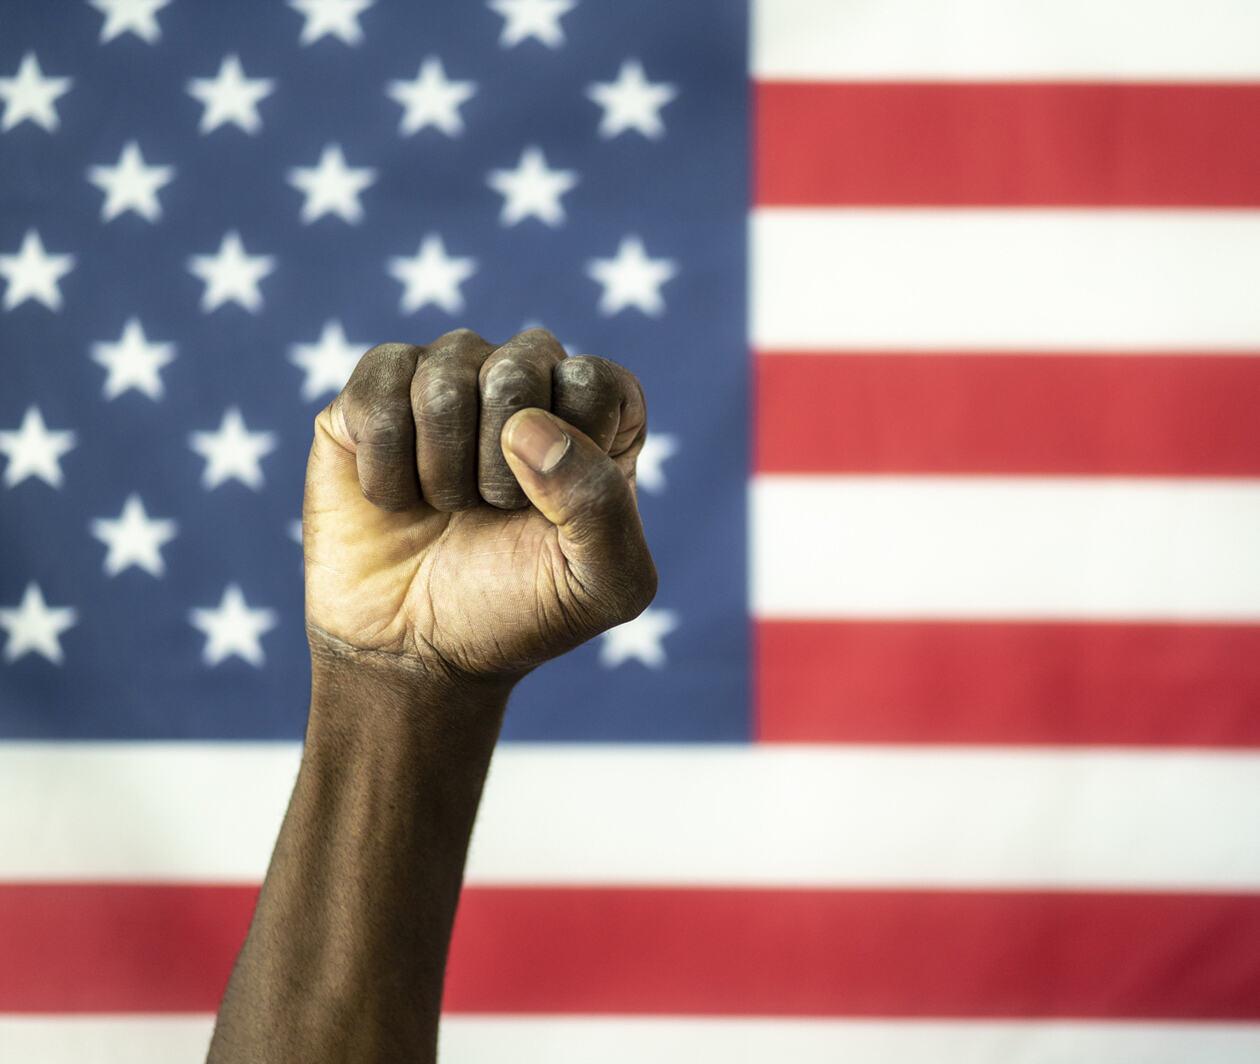 Anti-Black Racism in America